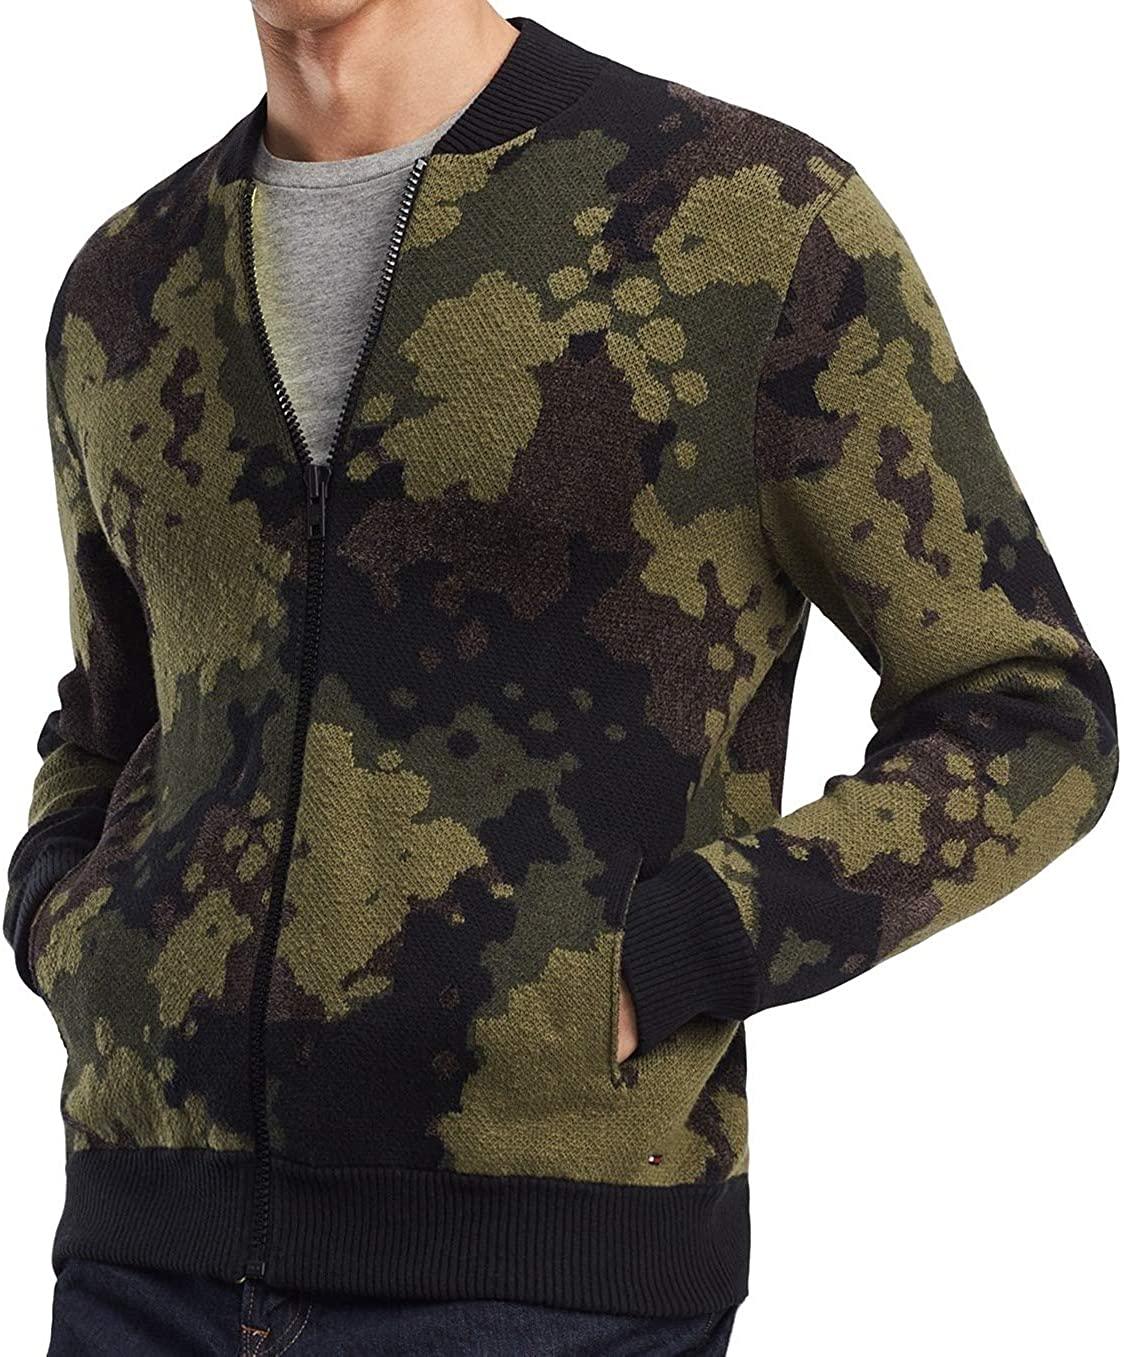 Tommy Hilfiger Mens Baseball Knit Sweater